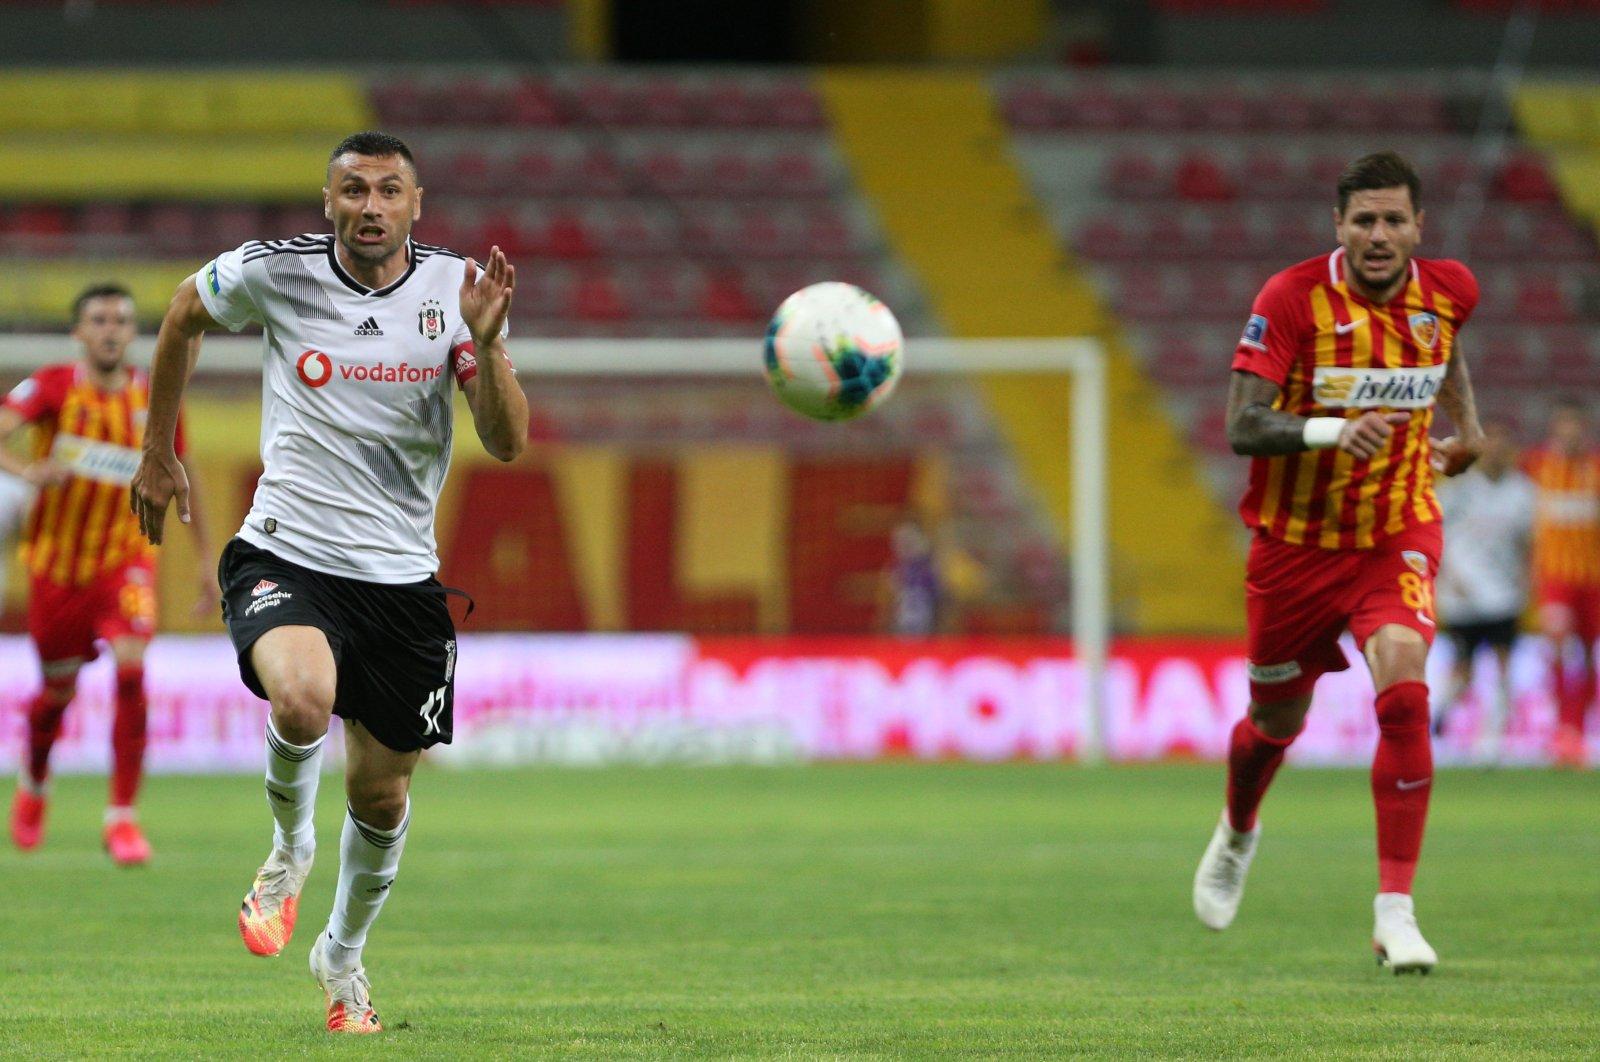 Beşiktaş striker Burak Yılmaz (L) was signed by French club LOSC Lille on a free transfer on Aug. 1, 2020. (AA Photo)